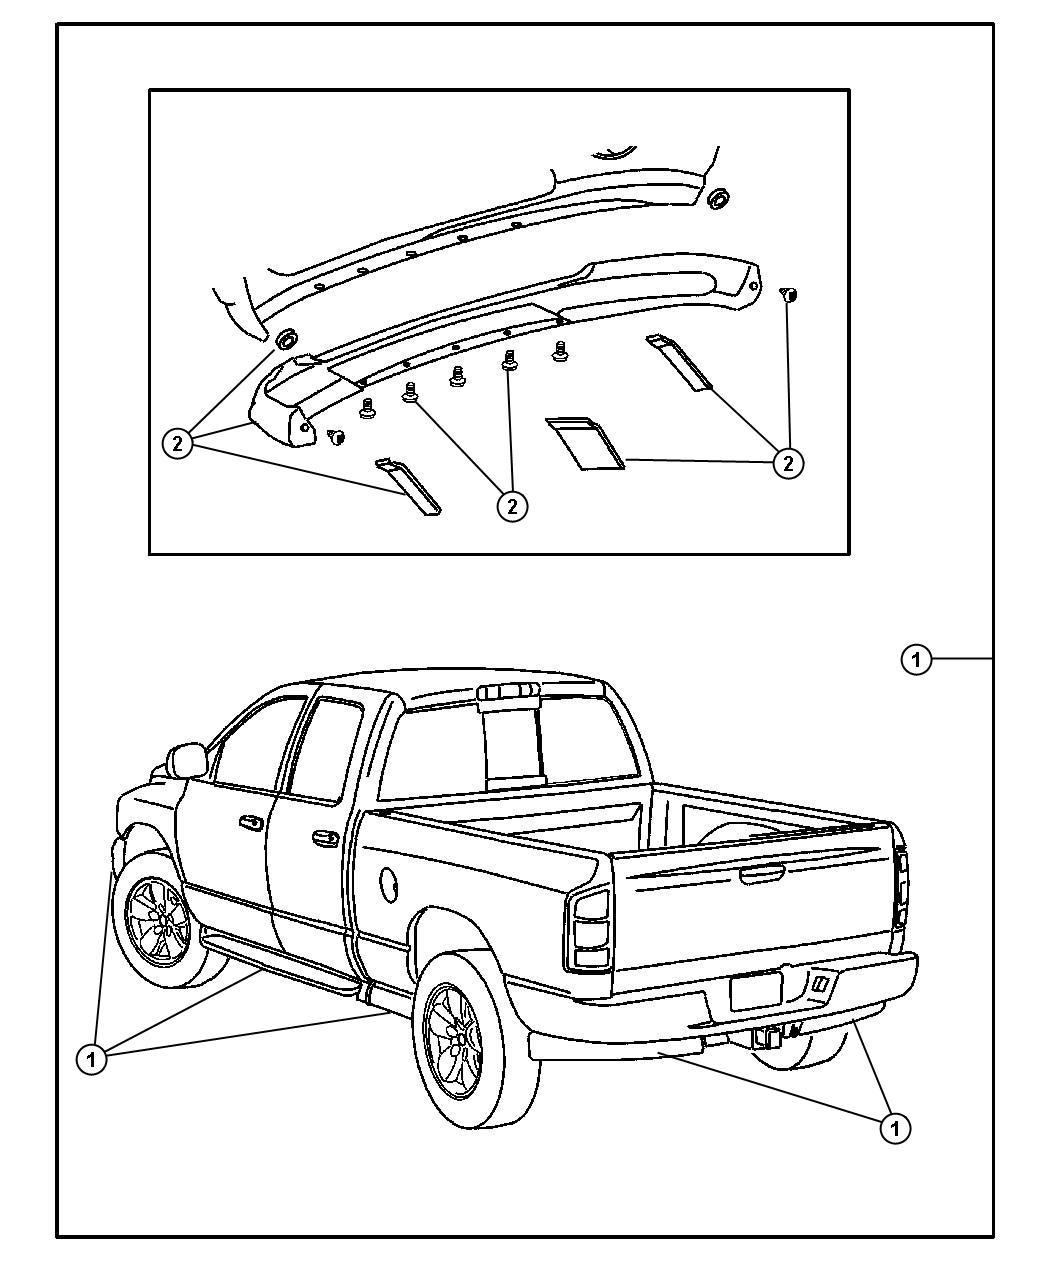 2003 Pt Cruiser Power Steering Diagram Com